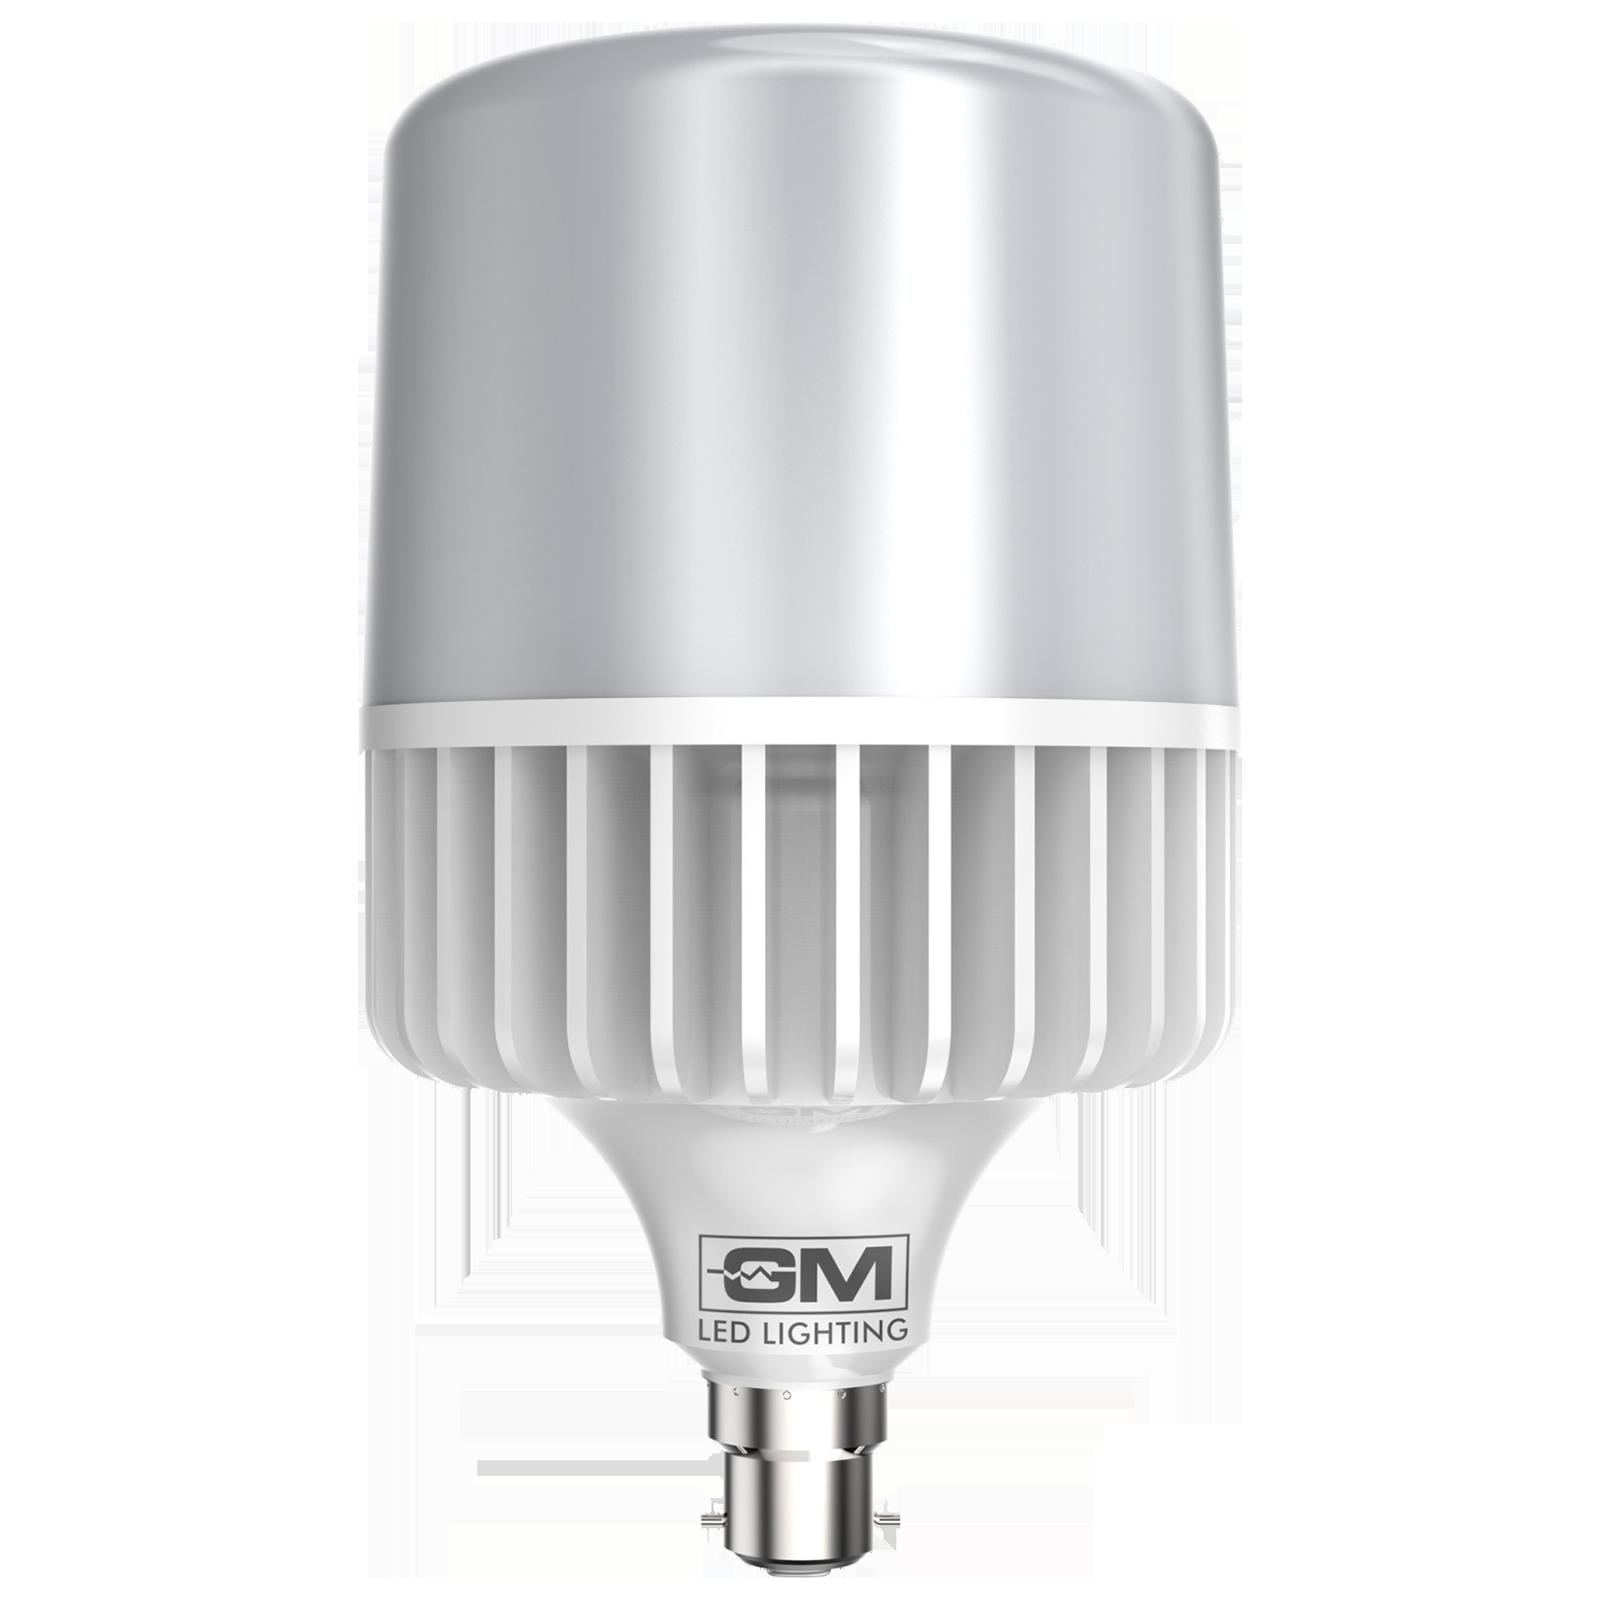 GM GLO 40 Watts Electric Powered LED Bulb (4000 Lumens, GBT-40-6.5K, White)_1